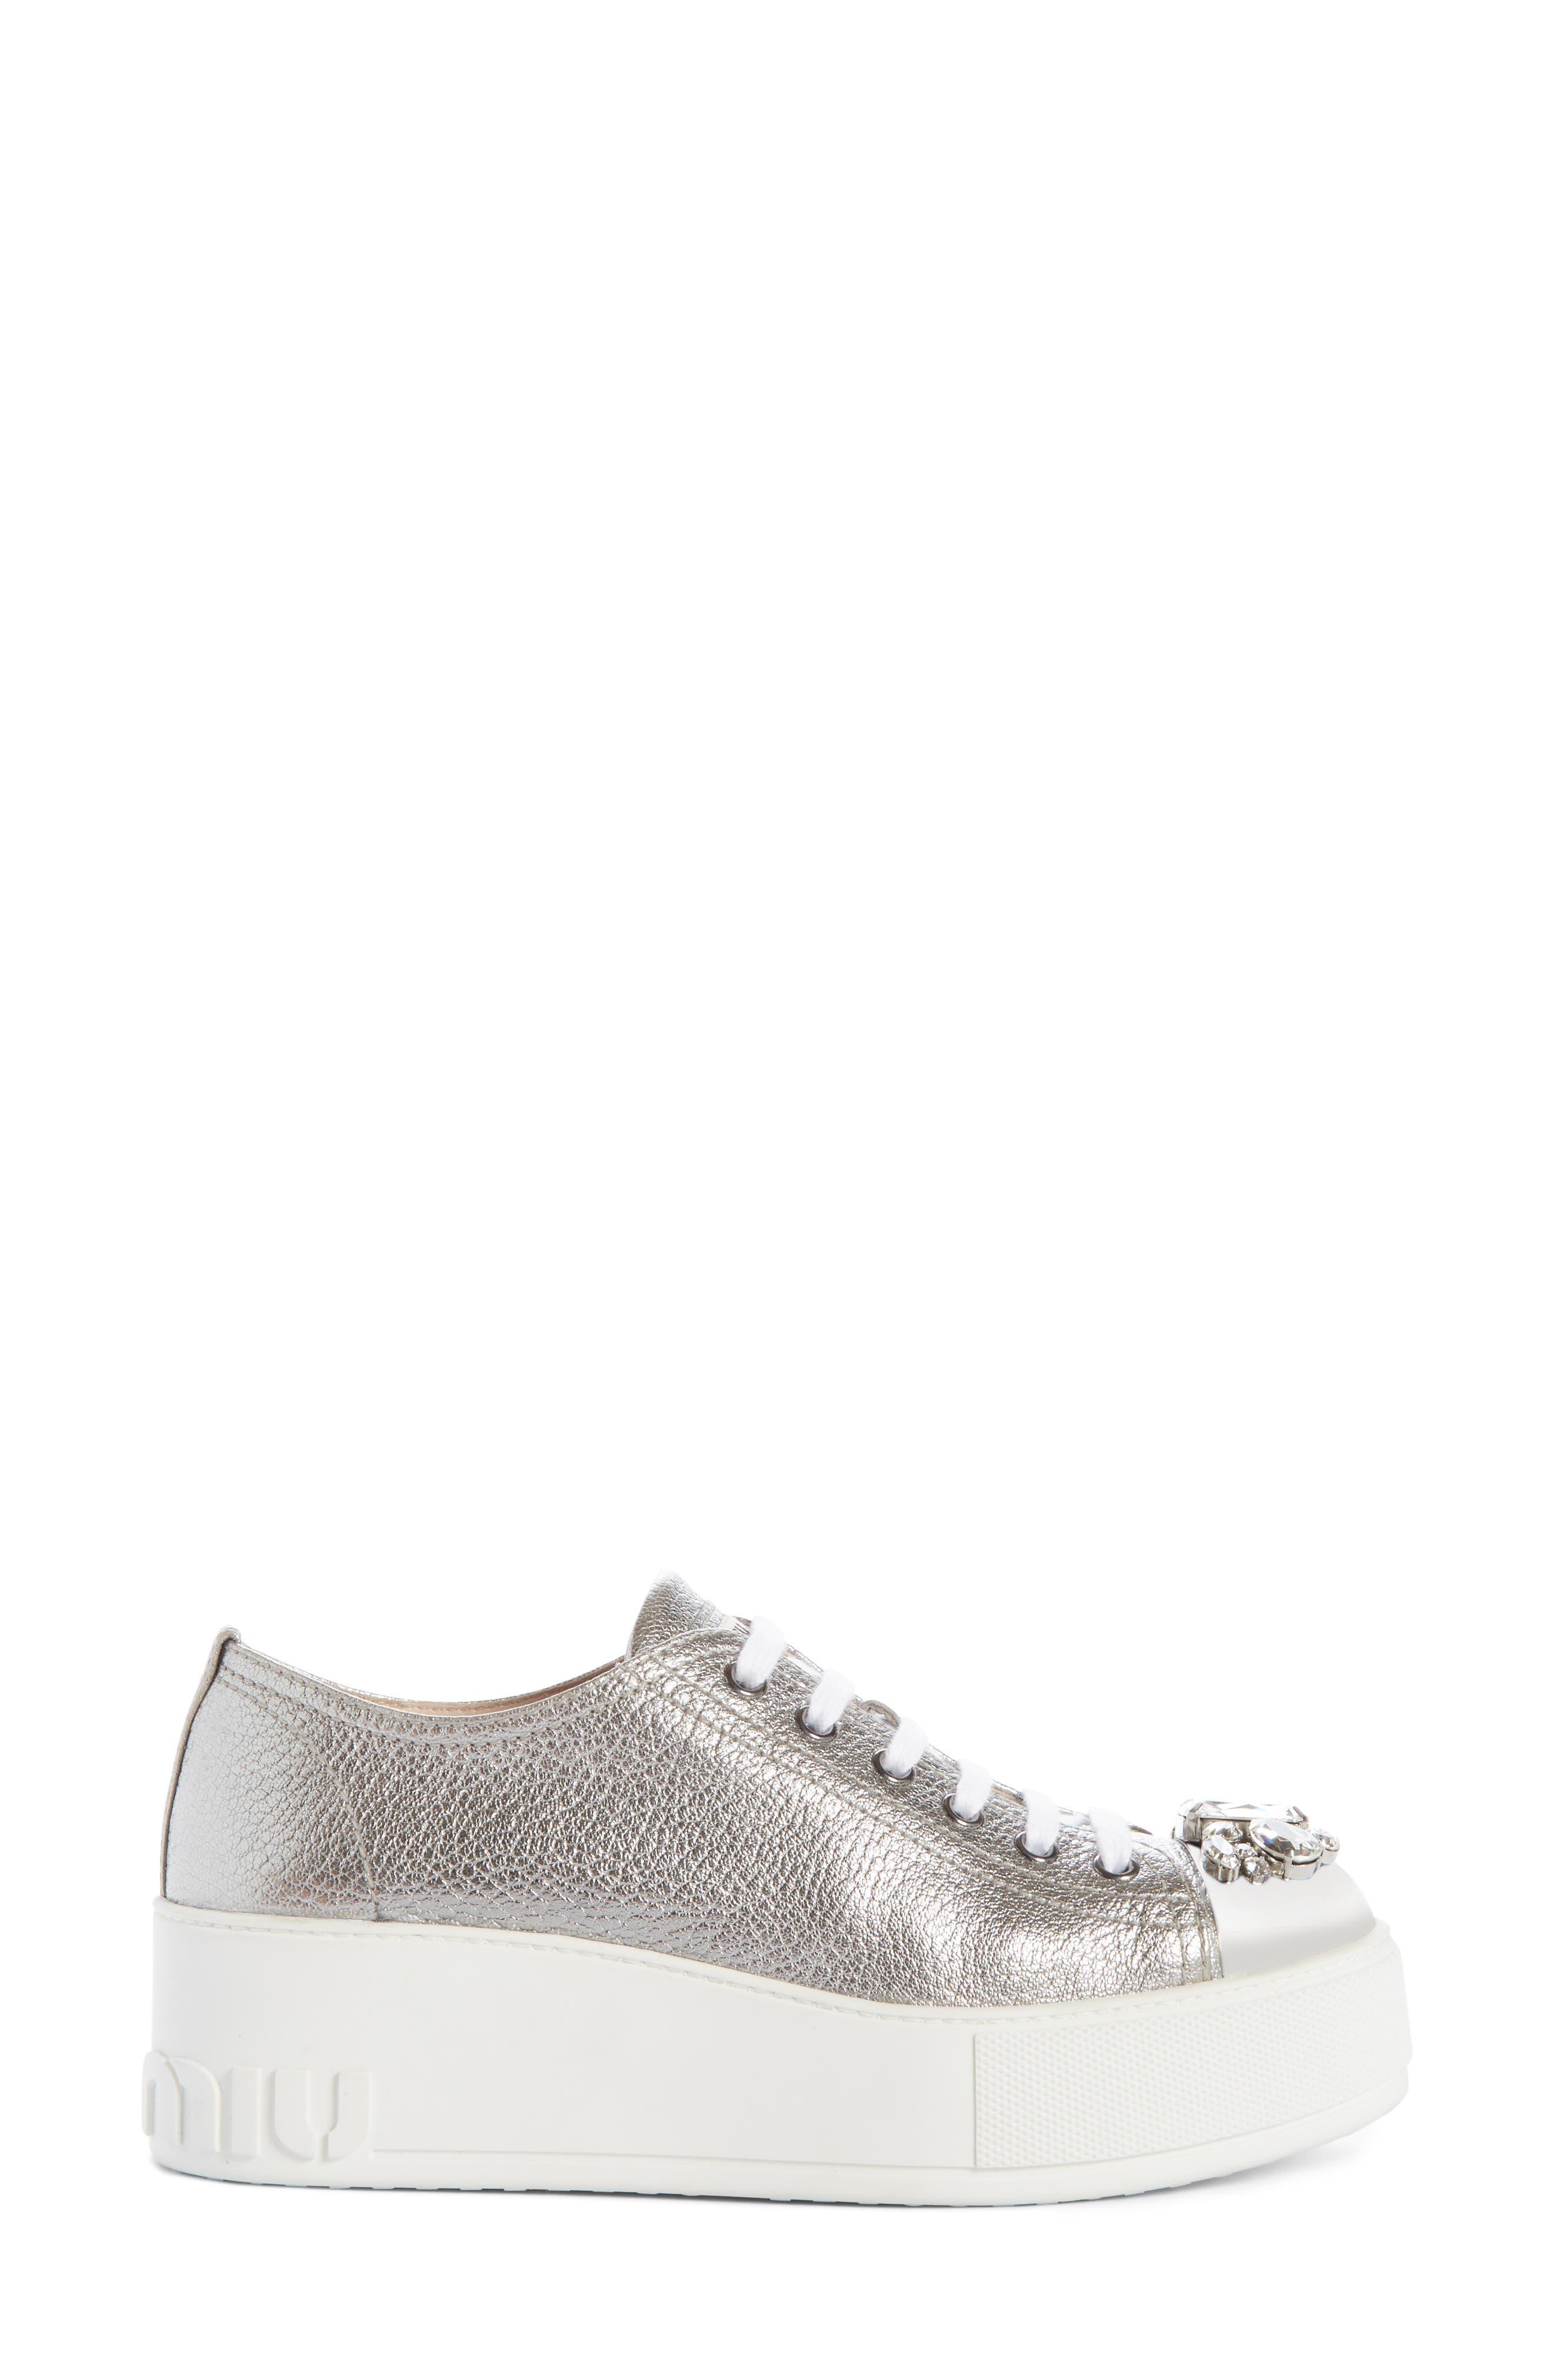 Crystal Cap Toe Sneaker,                             Alternate thumbnail 3, color,                             SILVER